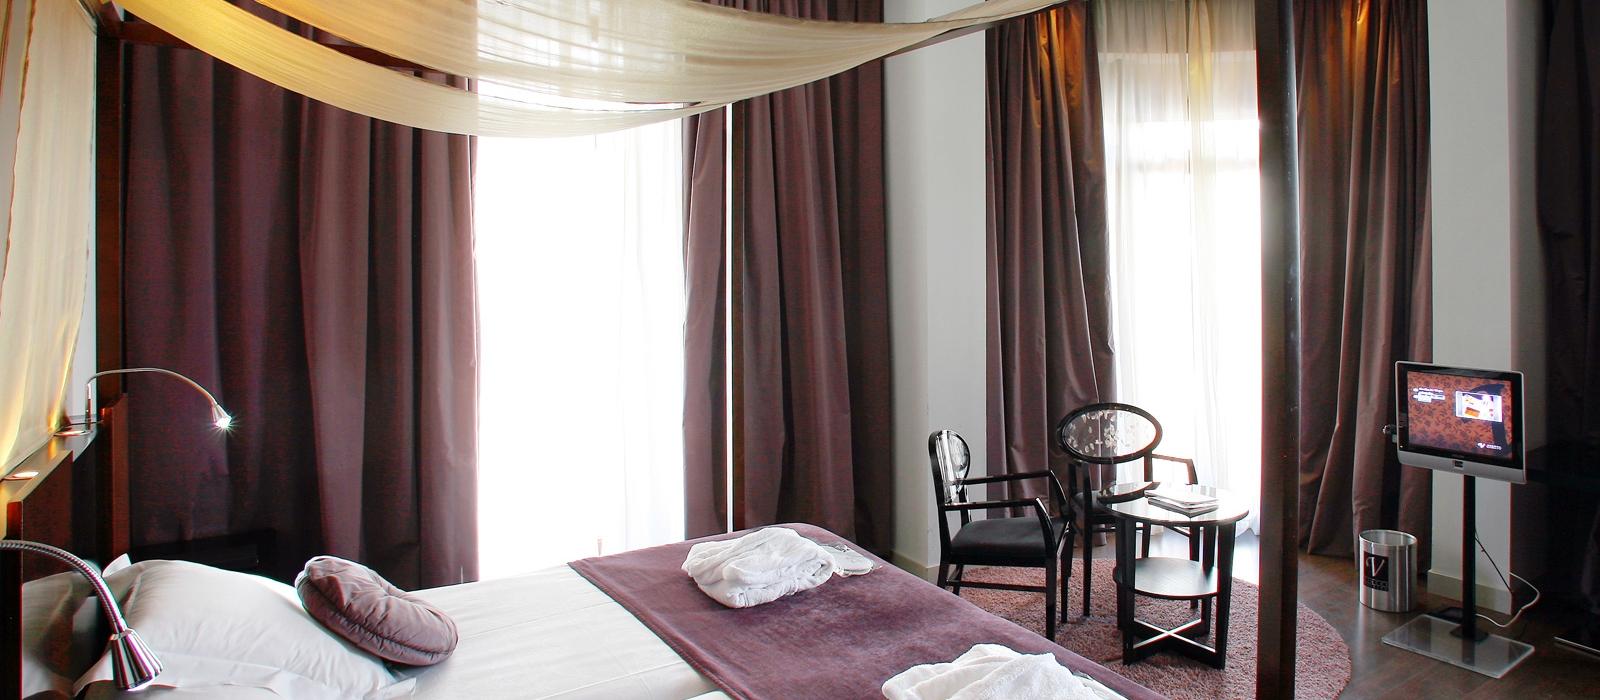 Camere Superior - Vincci Palace 4*